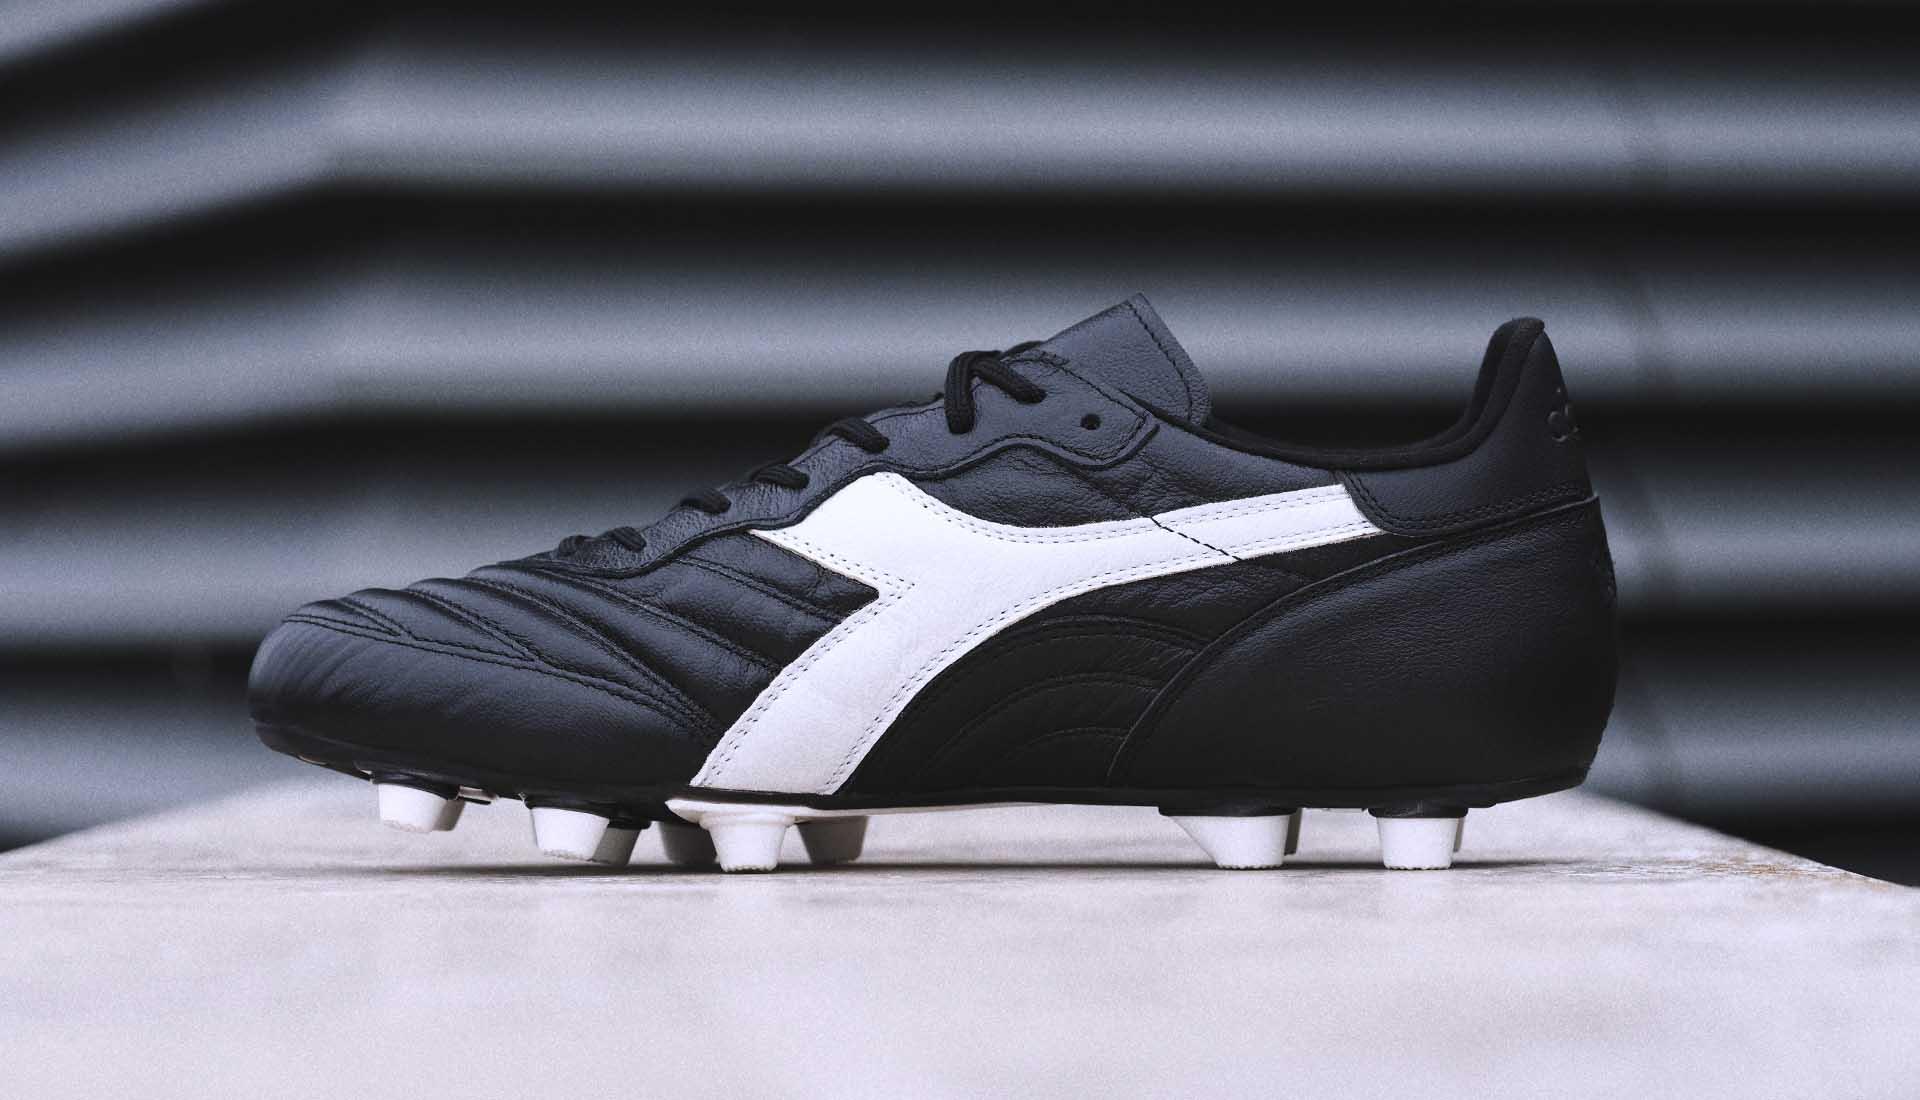 Diadora Brasil 'Made In Italy' K Leather Pro